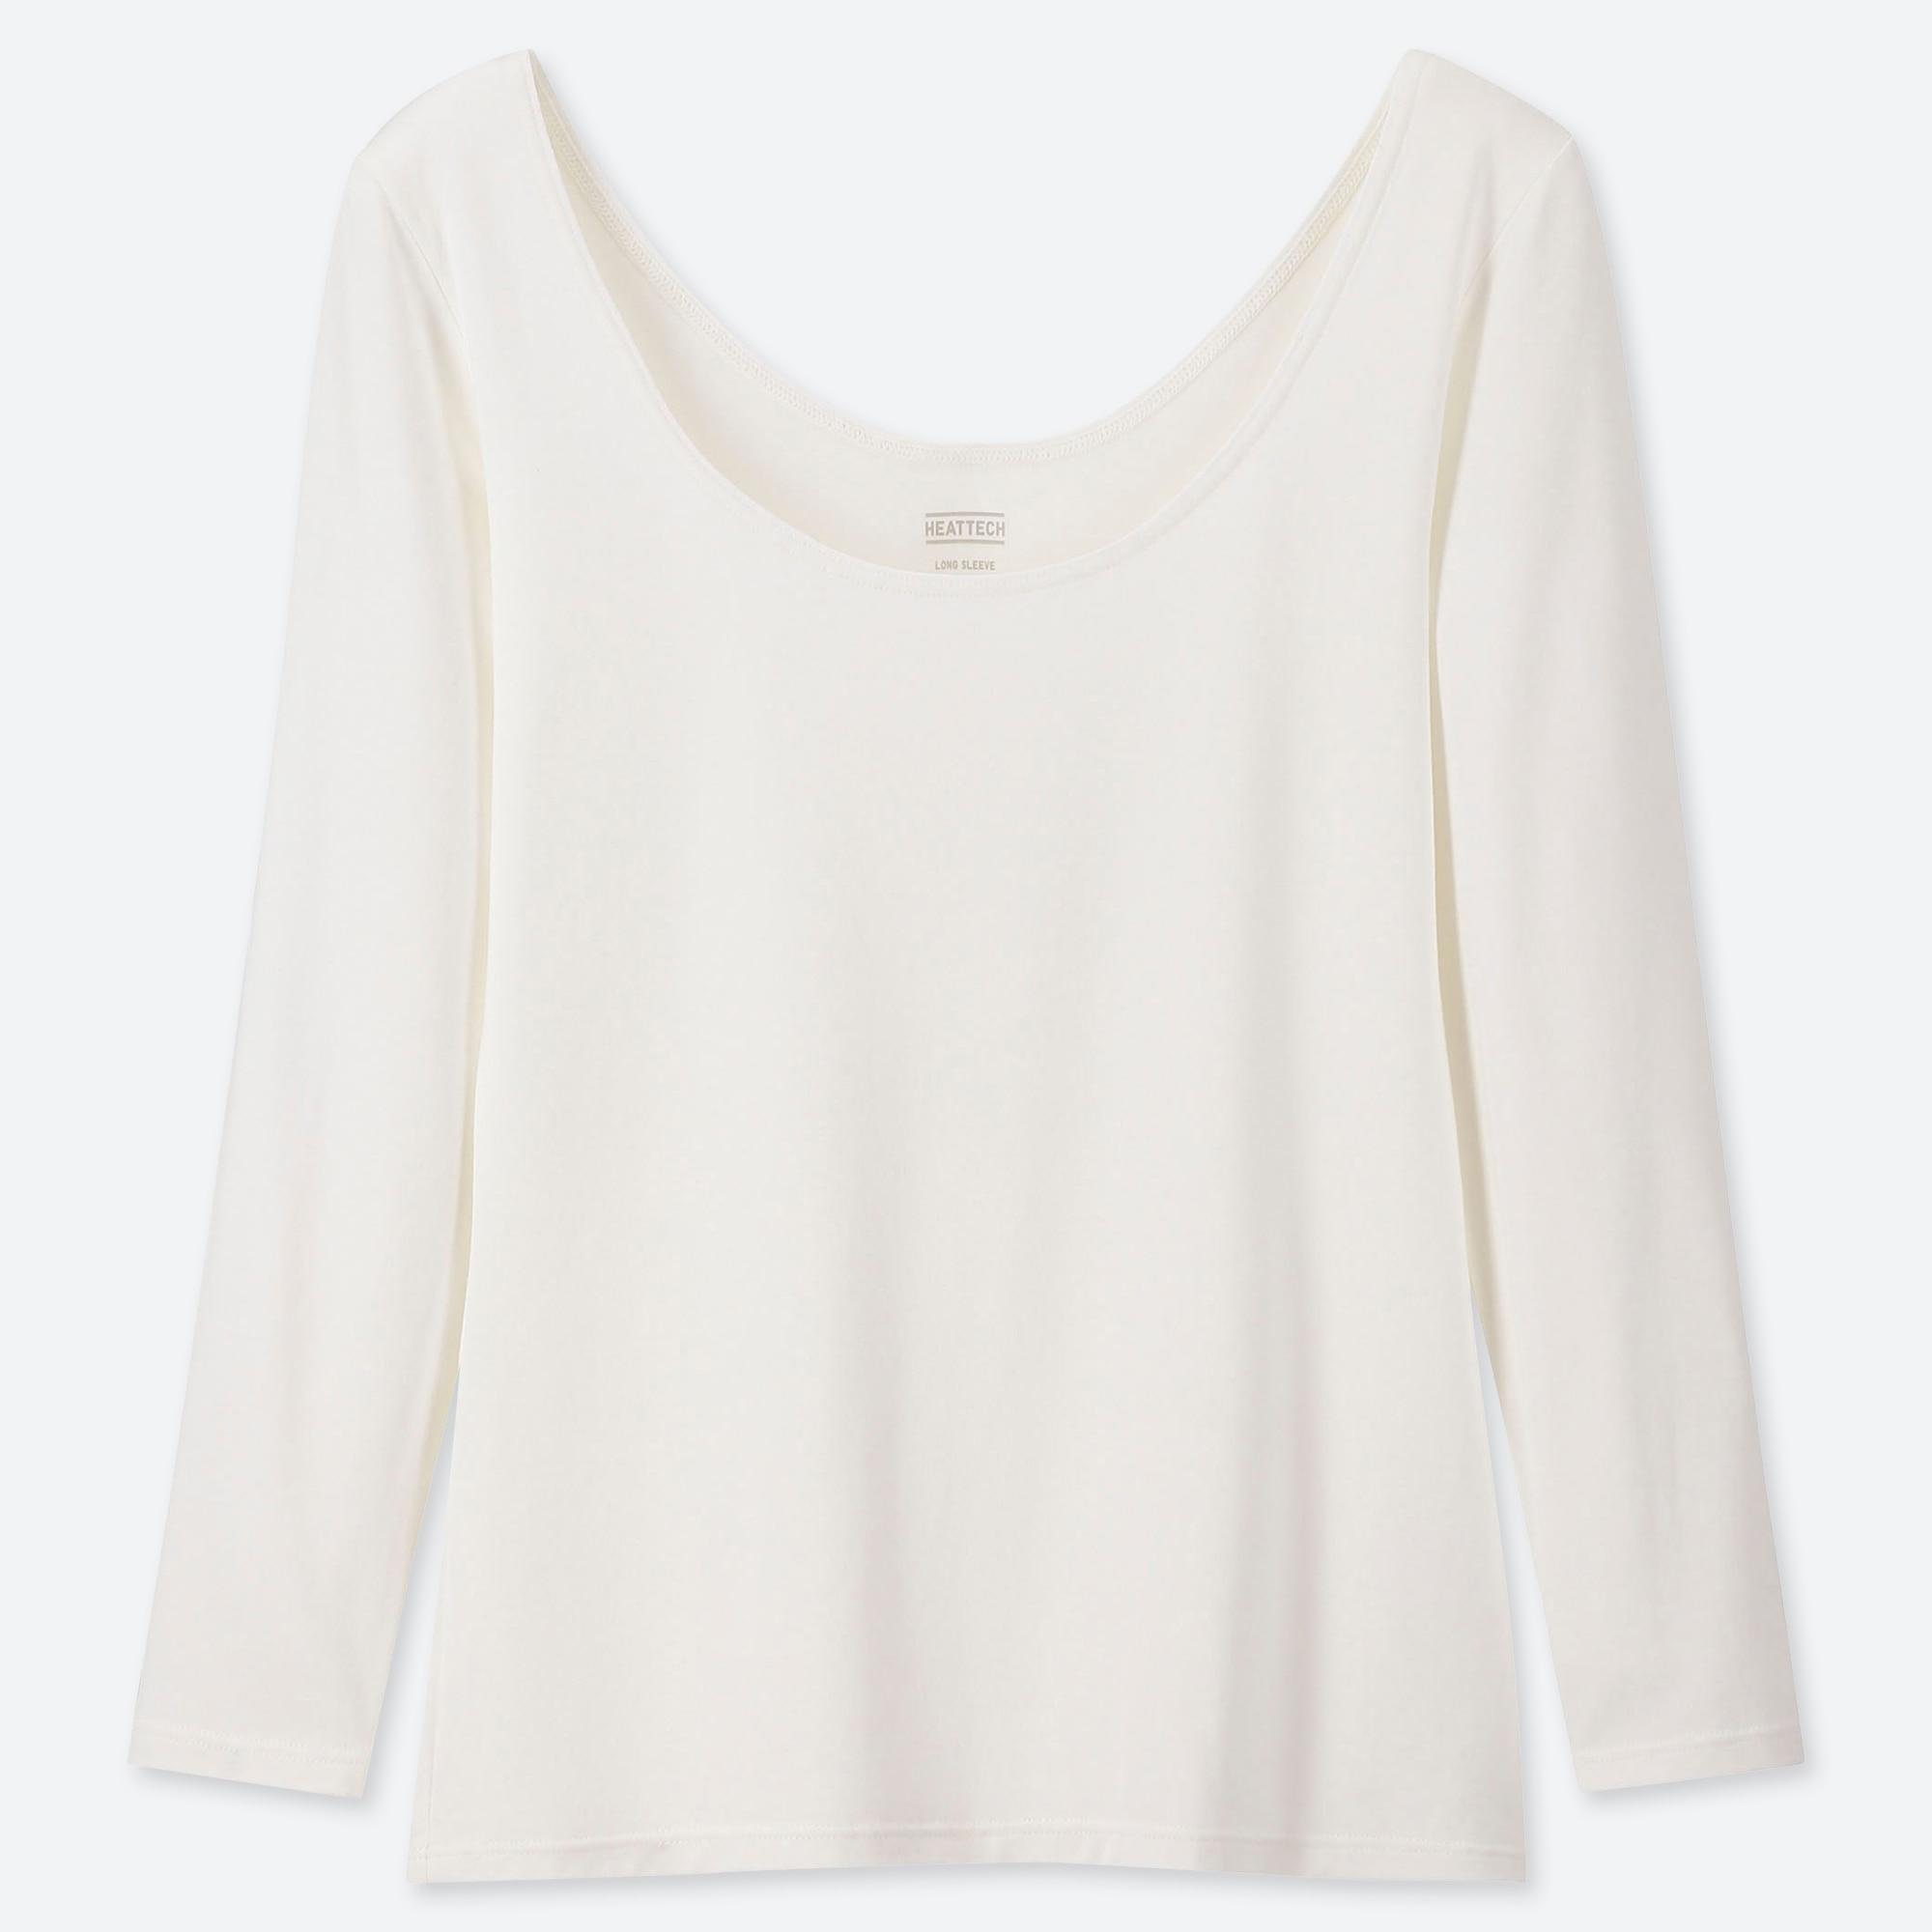 Larga Manga Camiseta Heattech Bailarina Cuello Mujer WEHe2ID9Y